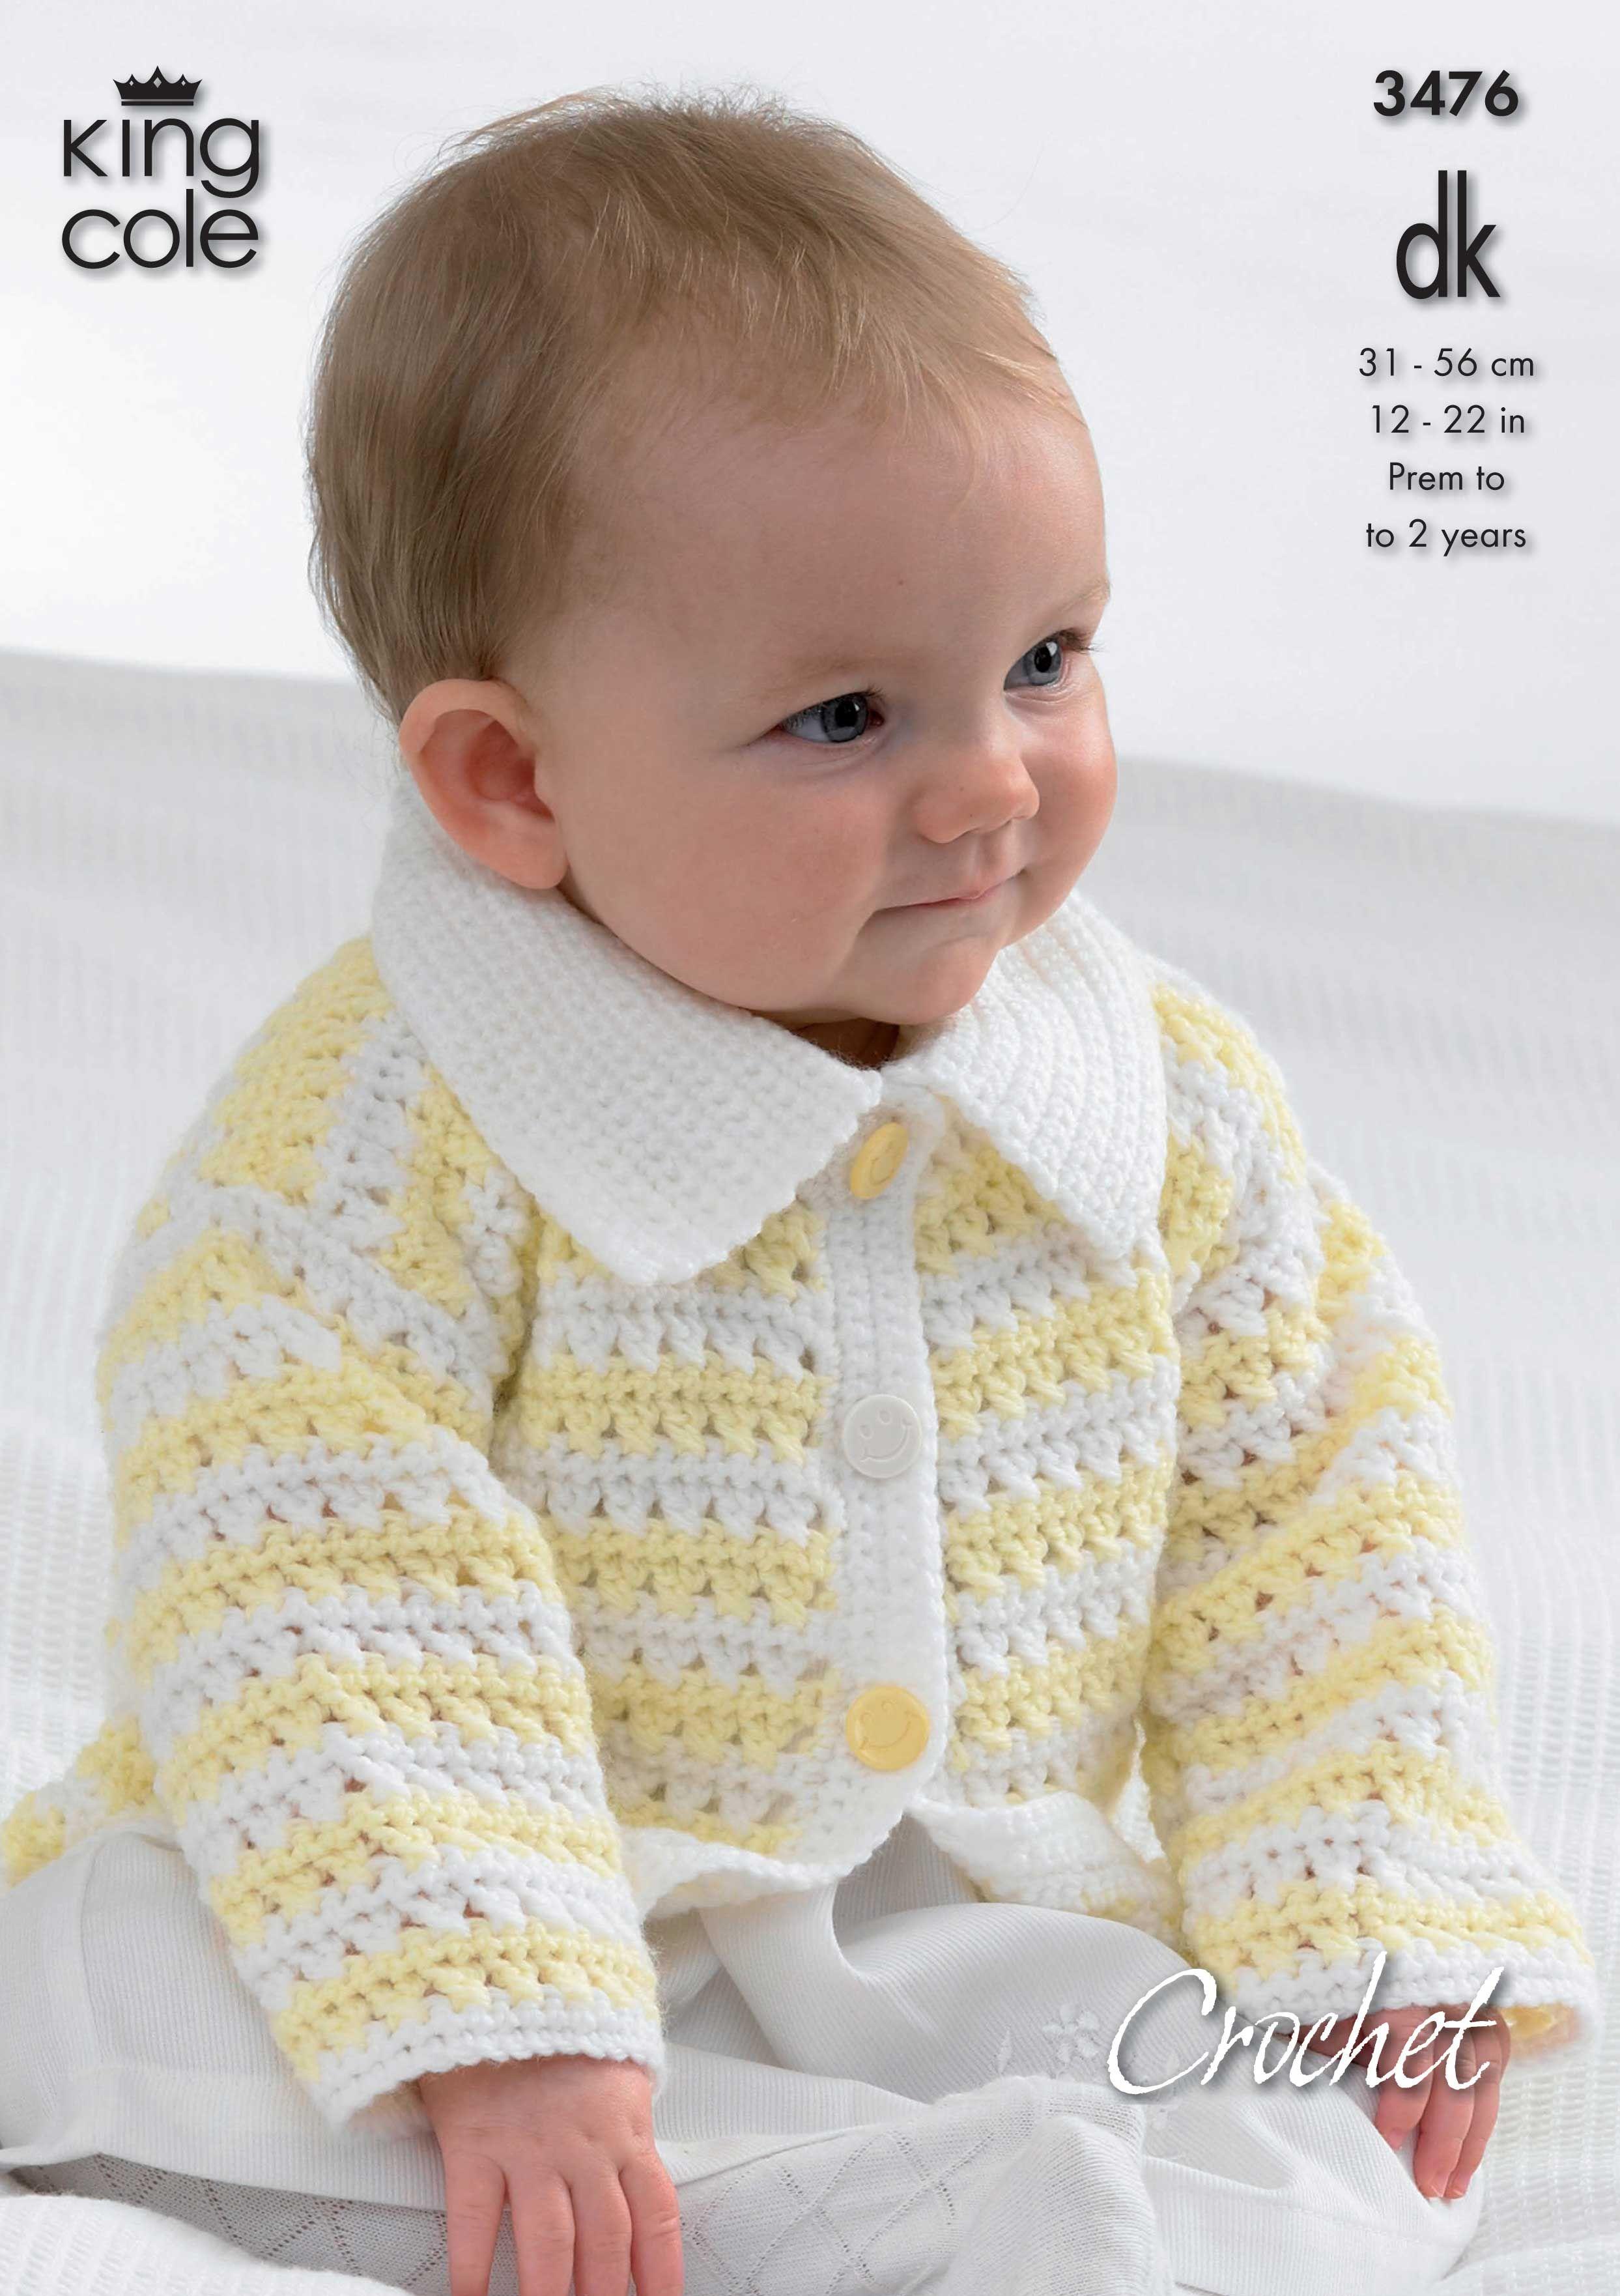 Crochet baby Cardigan with Collar - King Cole | Tejido | Pinterest ...